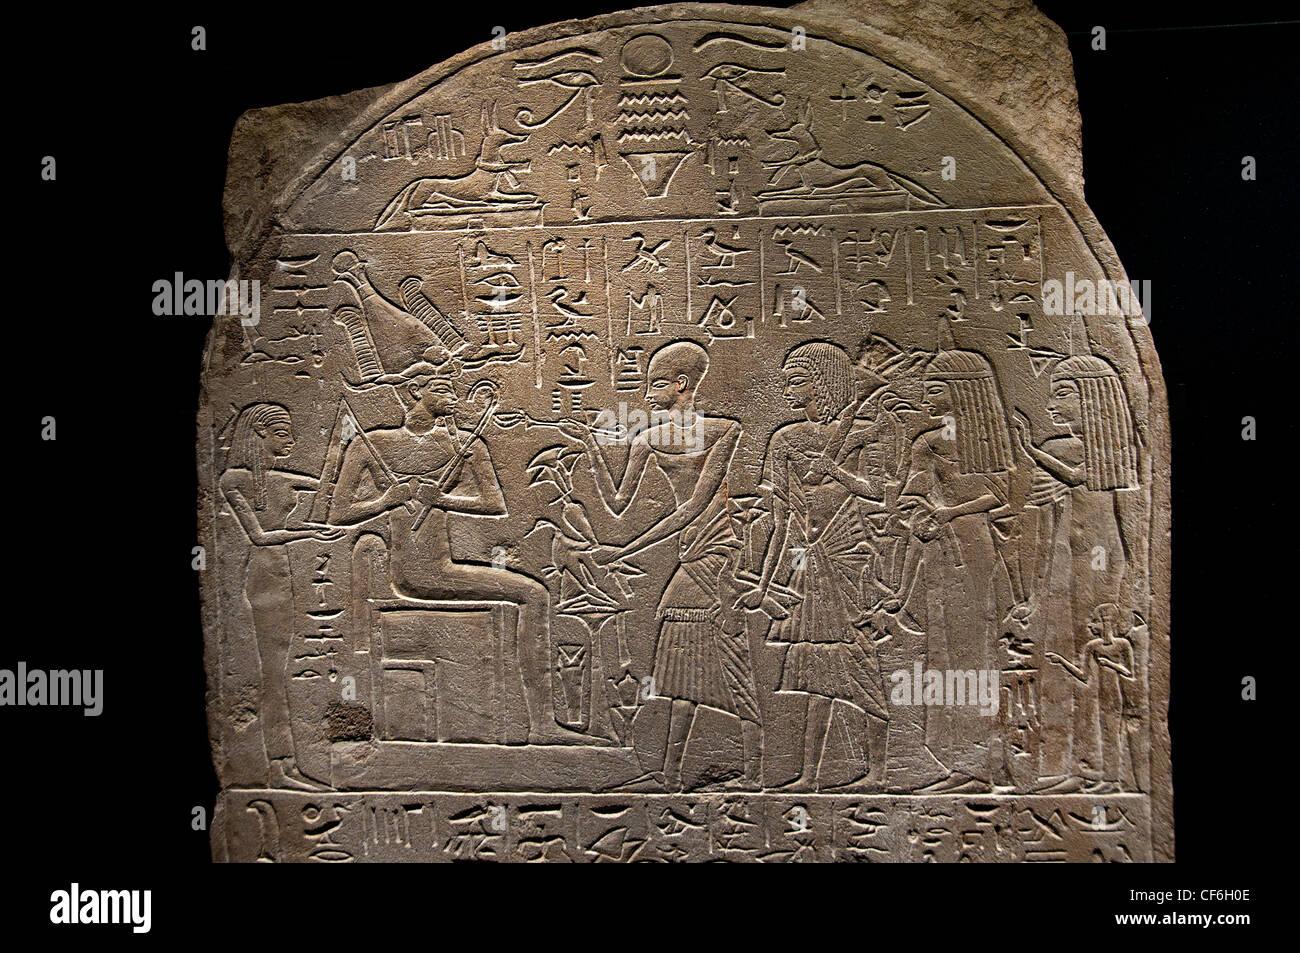 Stele Paser priest of Thoth around 1300 BC limestone Egypt Egyptian hieroglyph - Stock Image